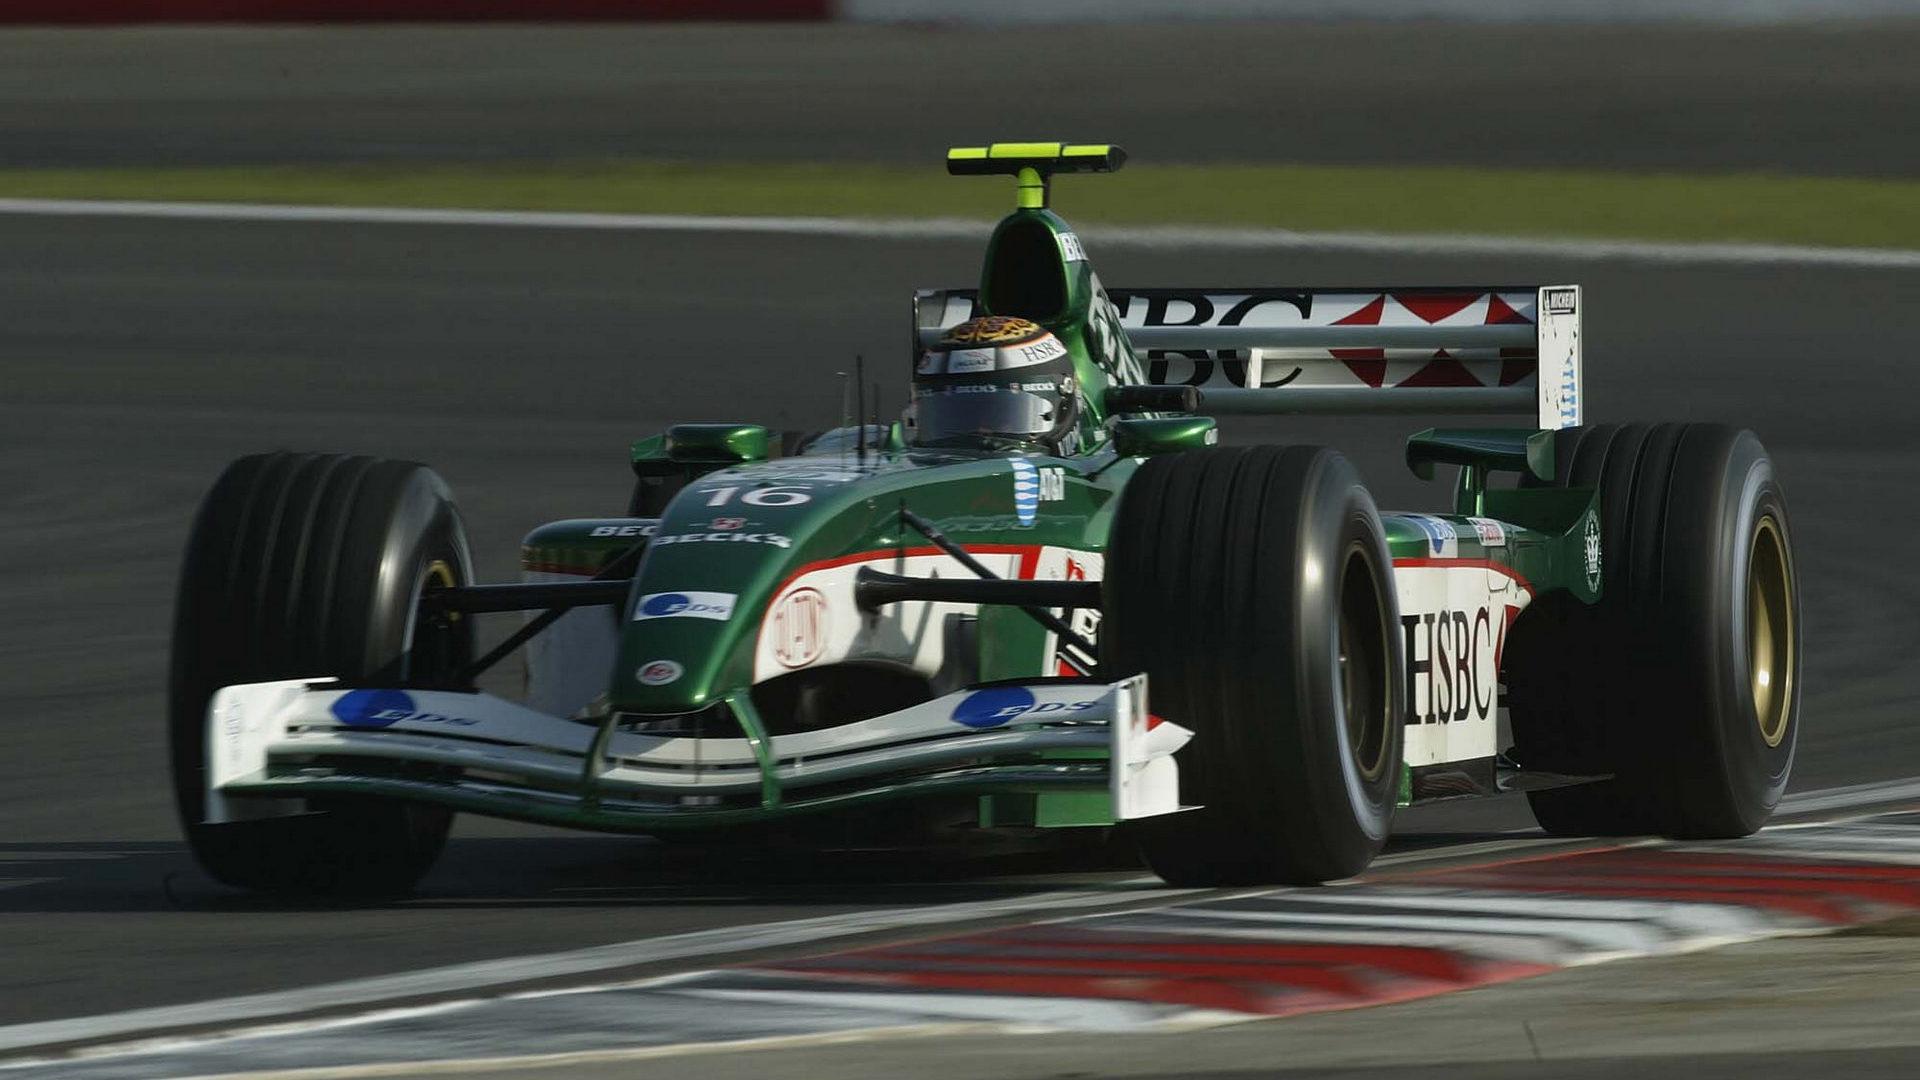 Hd Wallpapers 2002 Formula 1 Grand Prix Of Europe F1